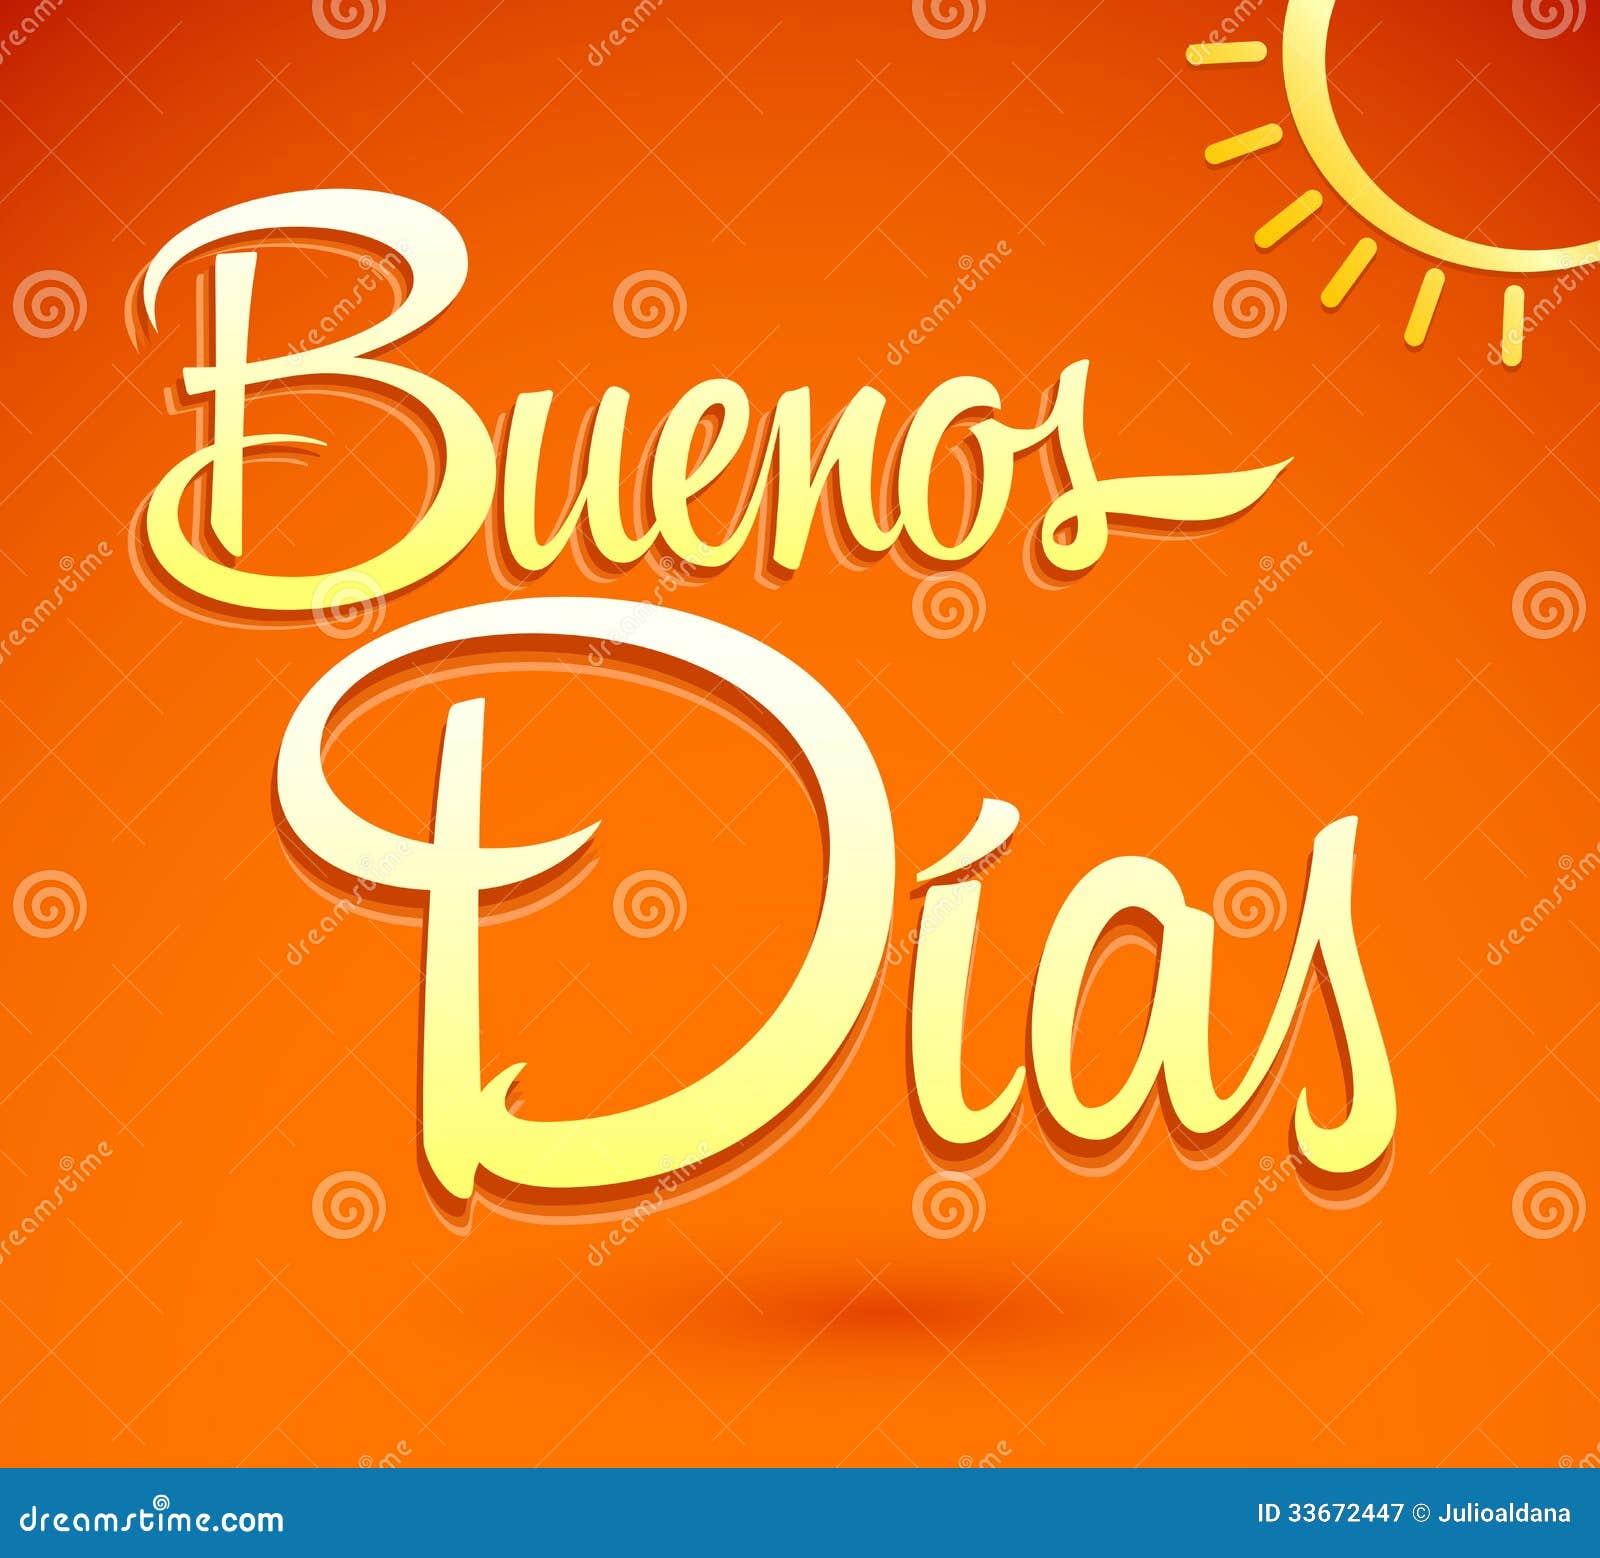 frasi buongiorno spagnolo